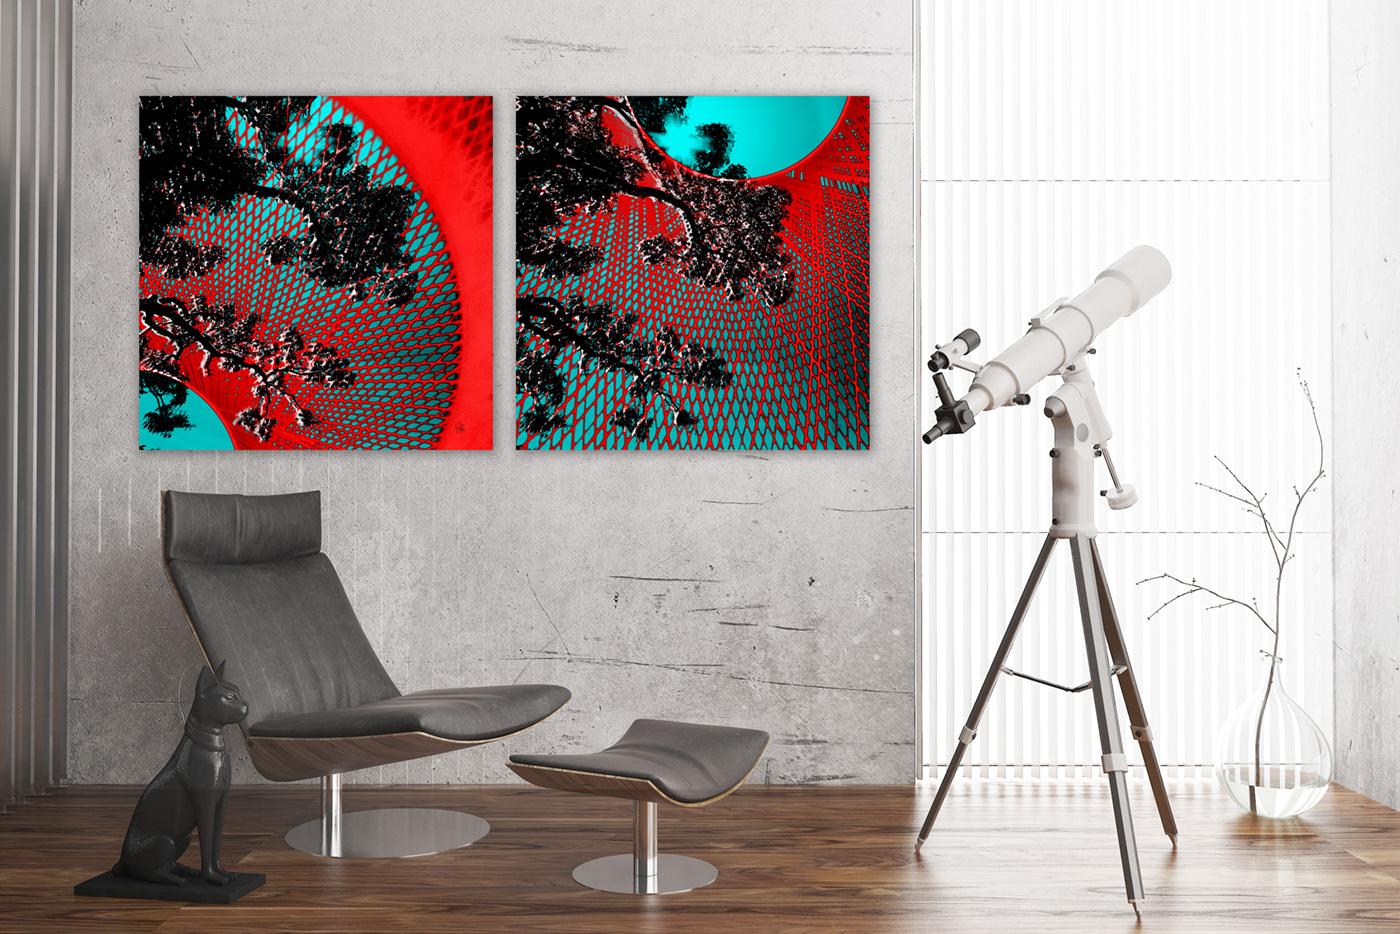 ConreteWall_telescope_TreeofSkyGeometrics1and2